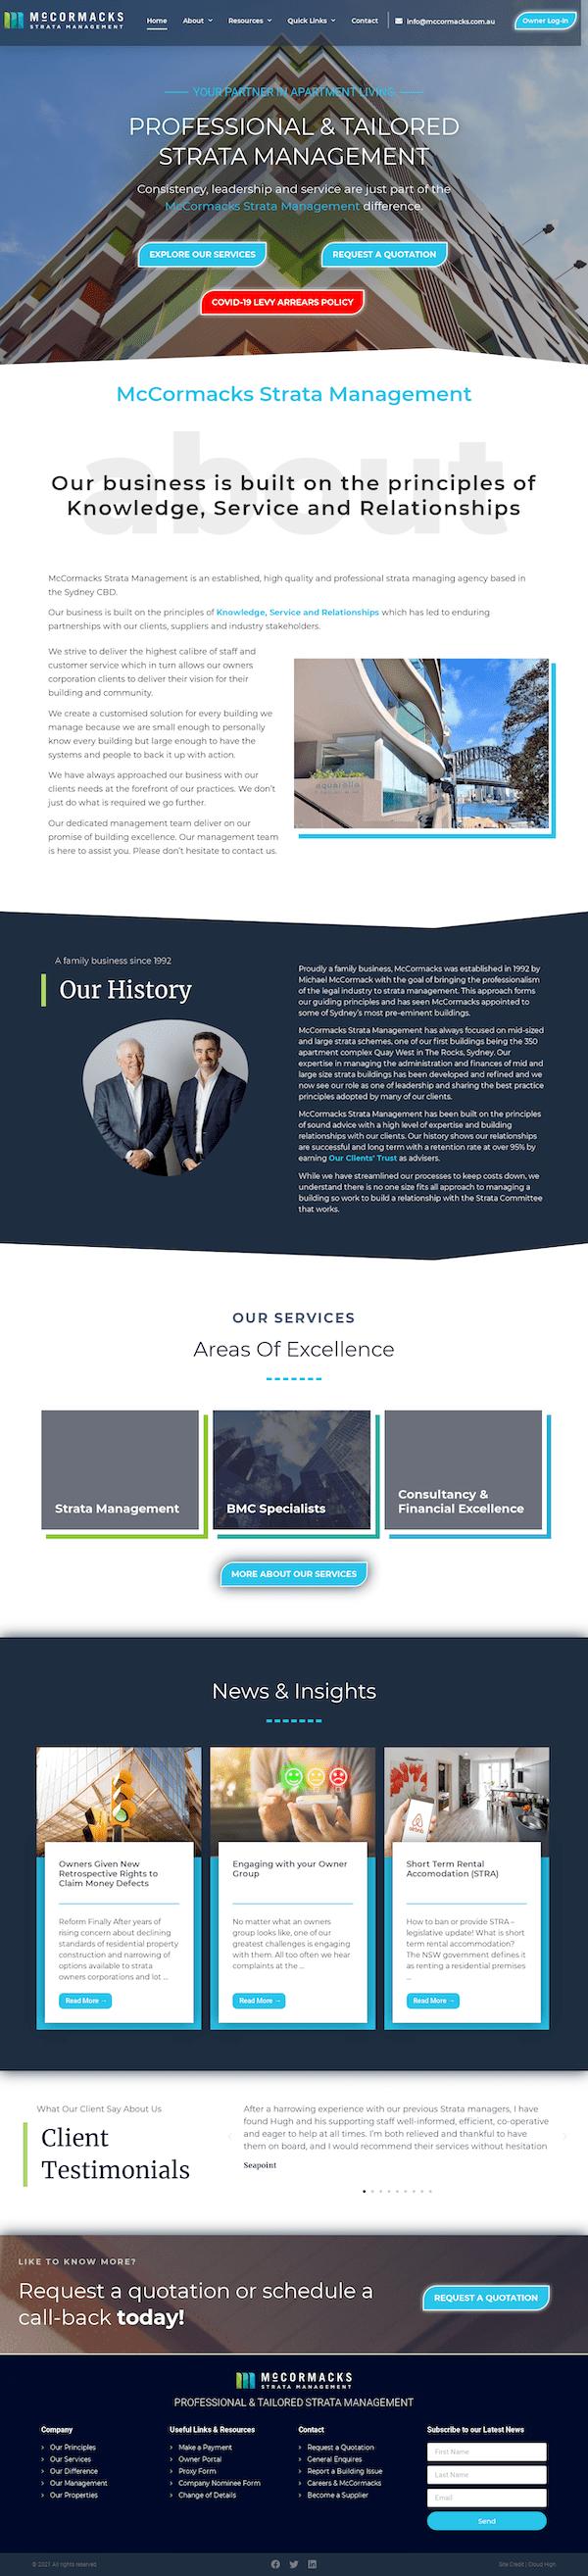 McCormacks Strata Management - McCormacks - Cloud High Website Design